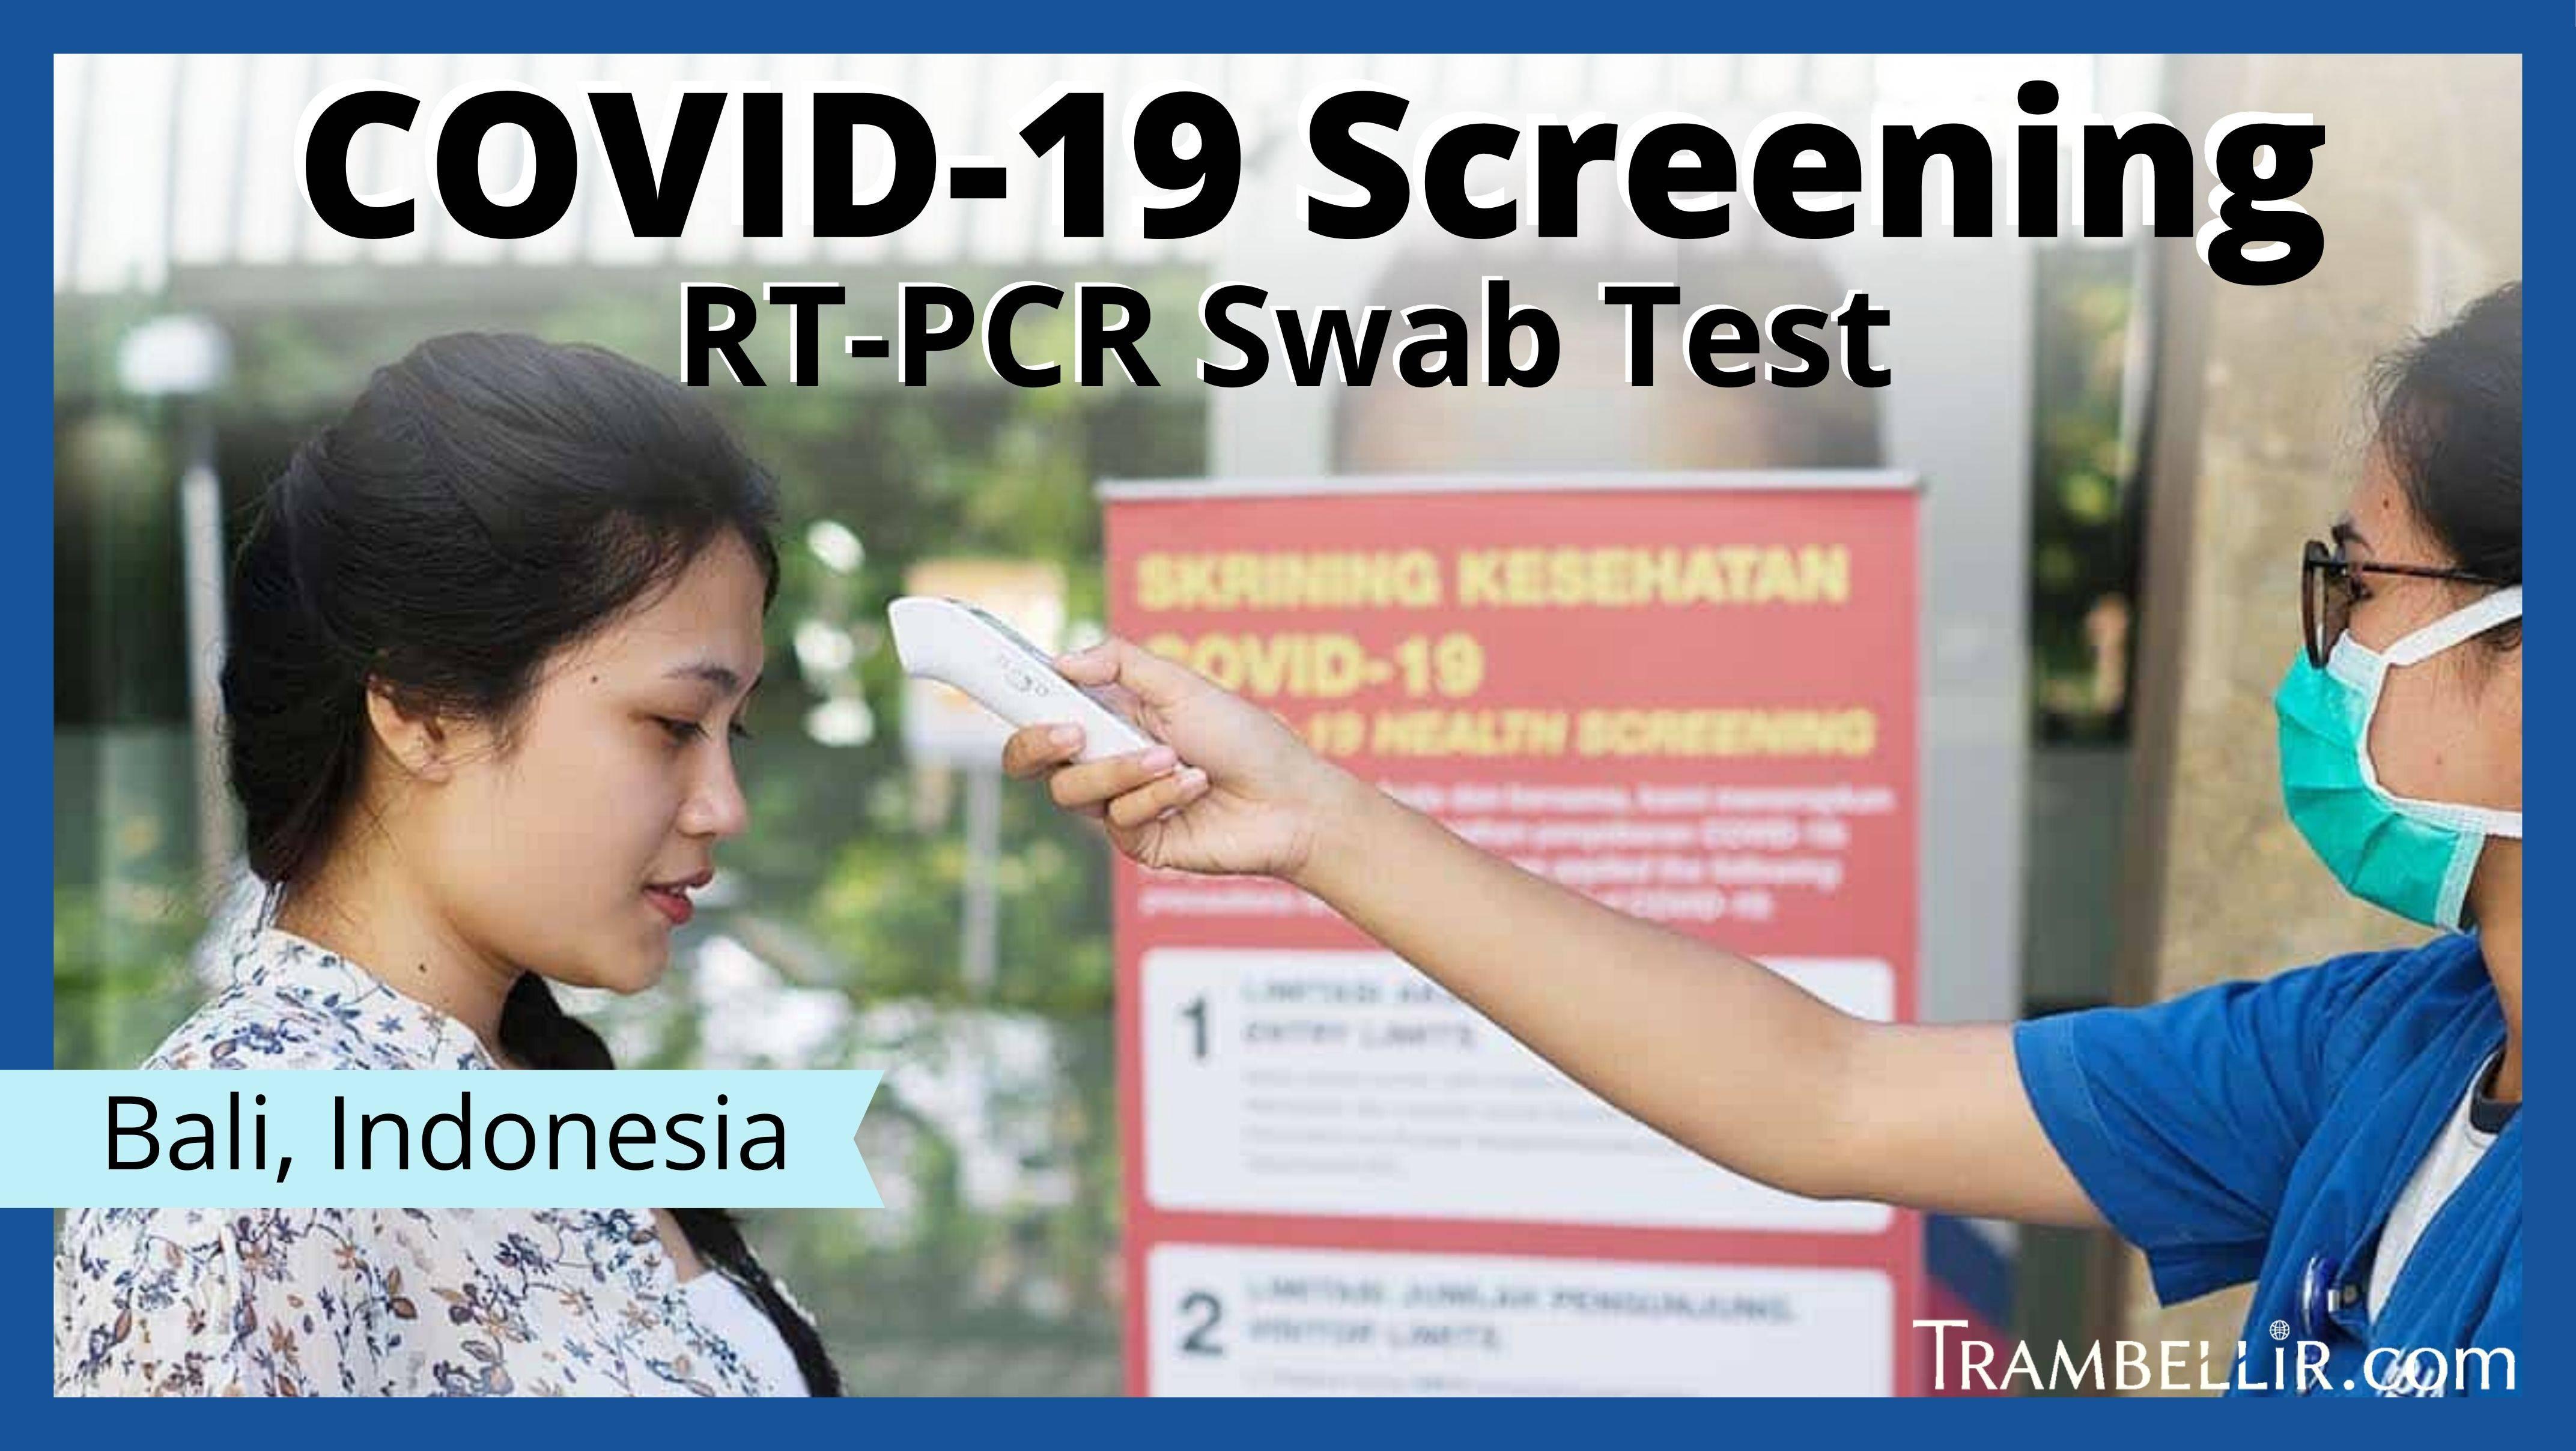 Covid 19 Rapid Test Rapid Testing Trambellir